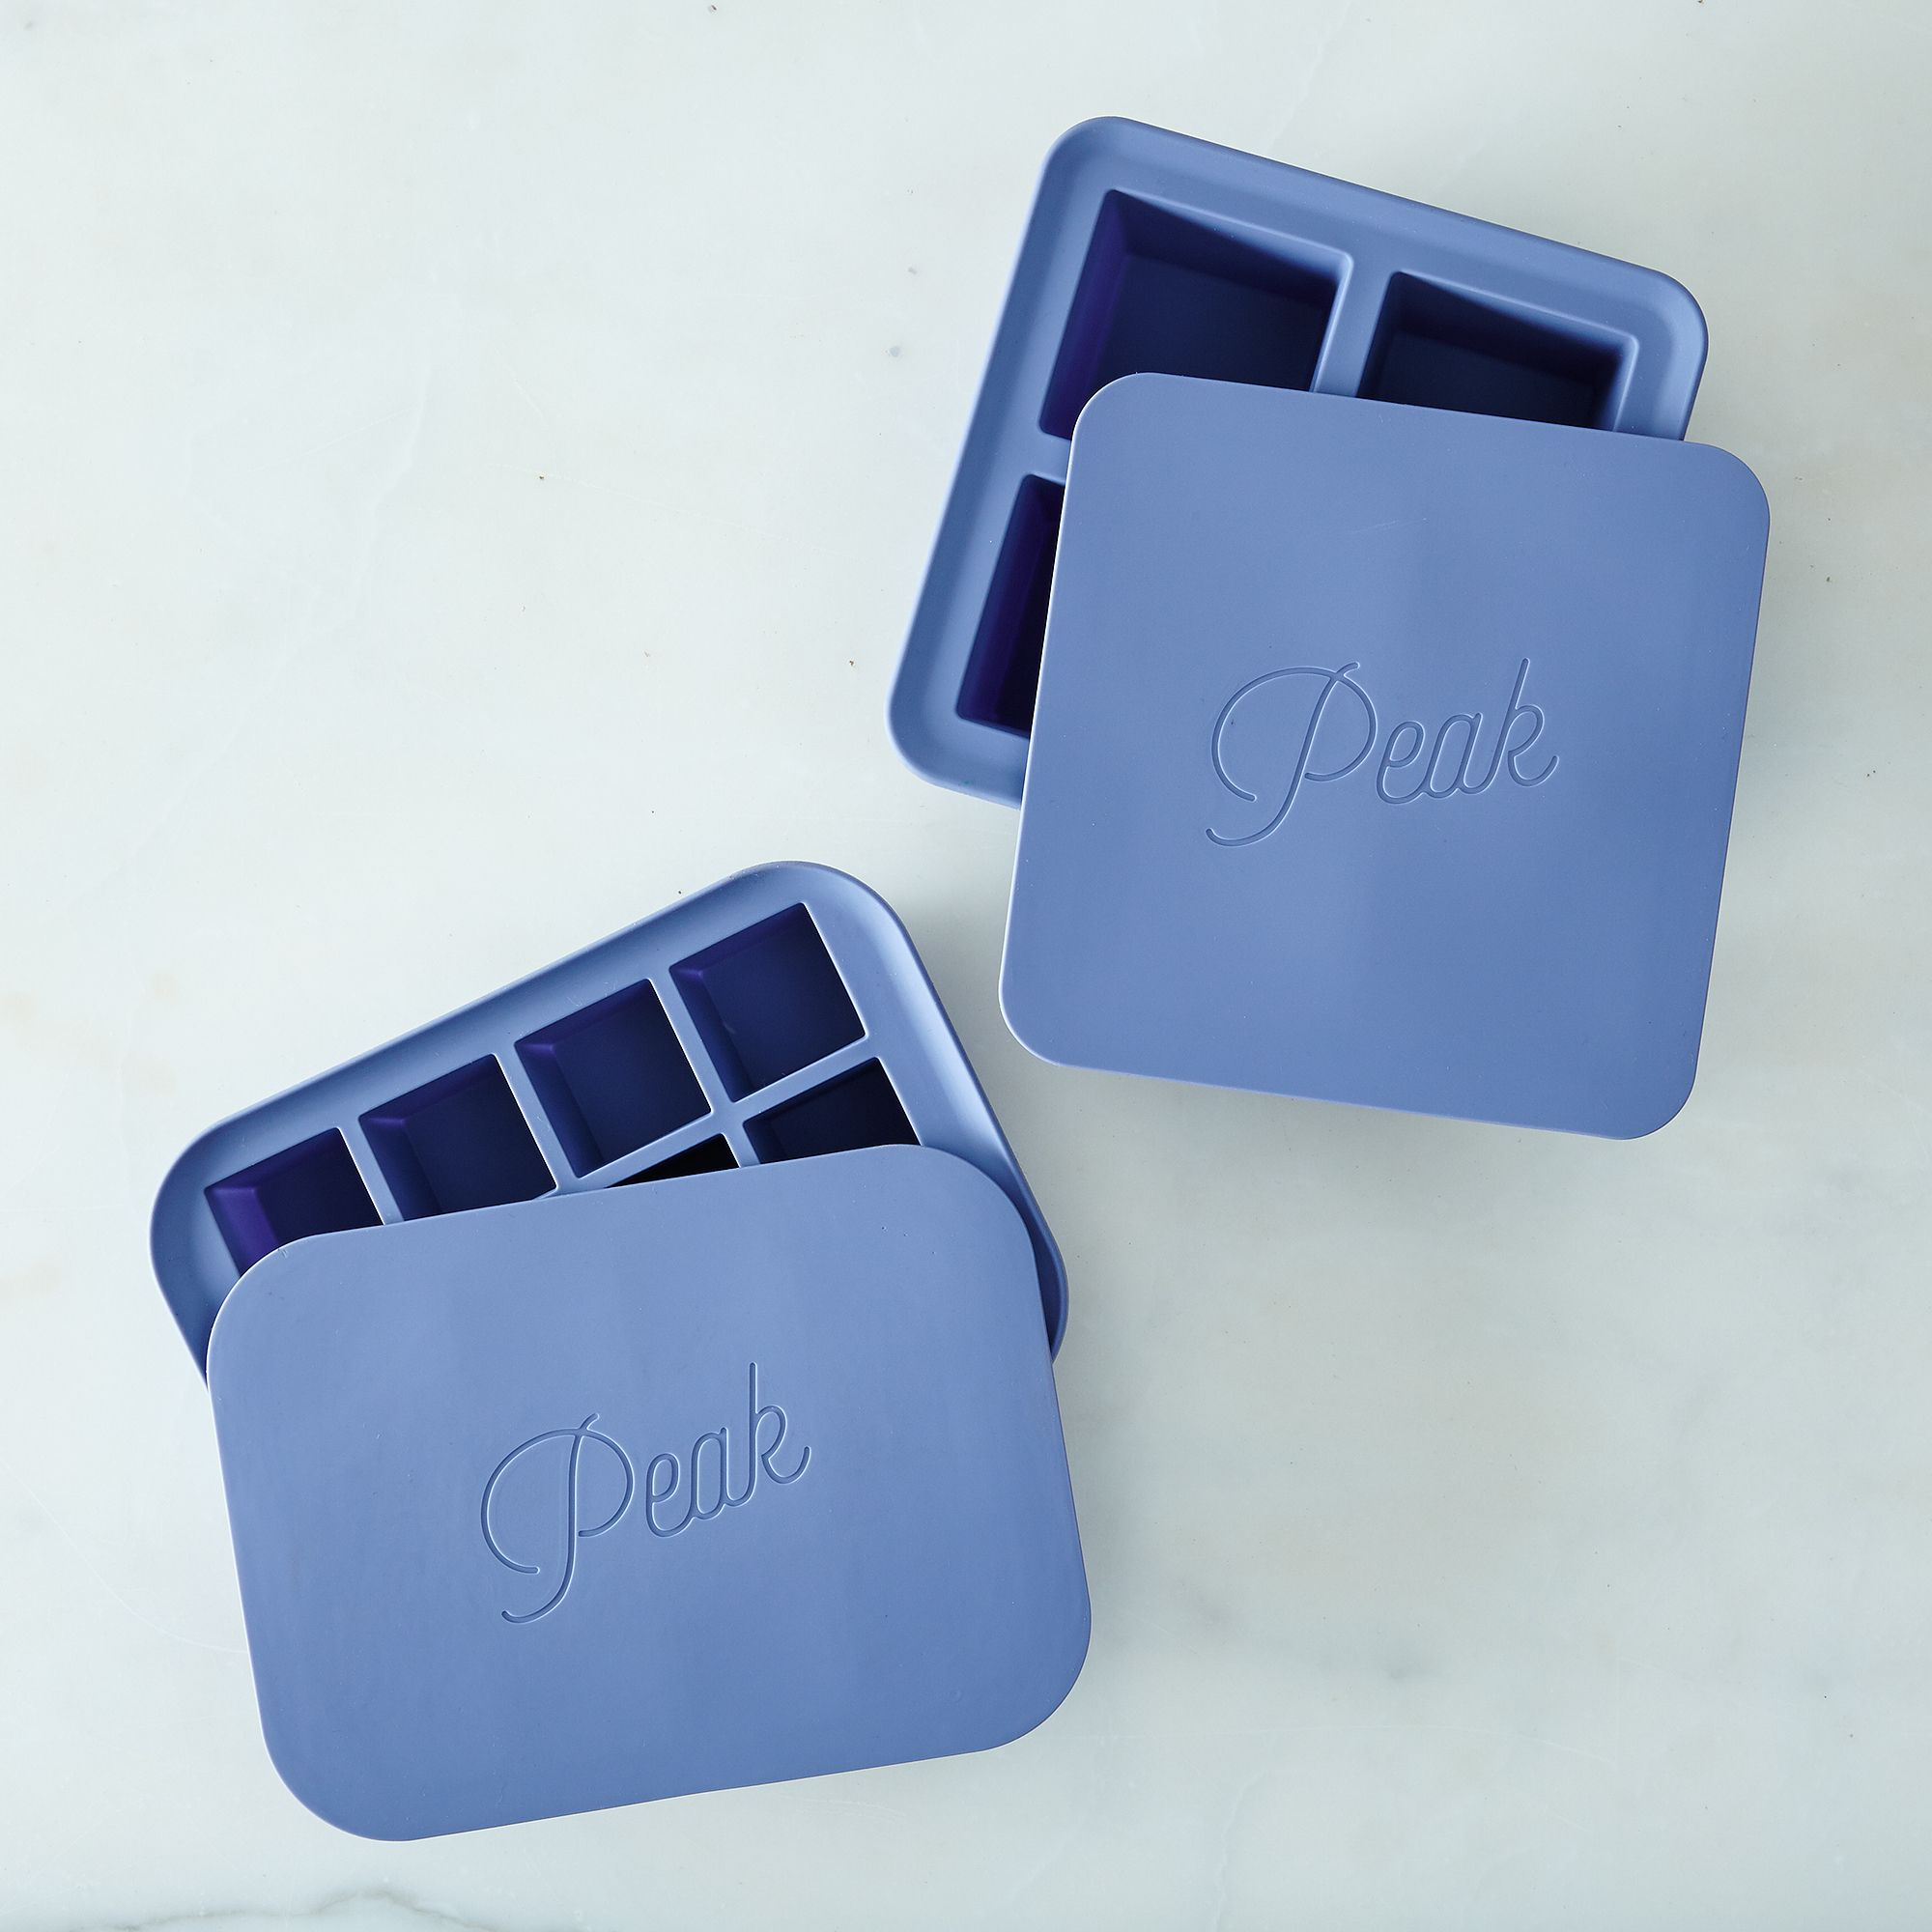 E1ce216d 634d 4b5a a9e9 f6cf9c563c67  2016 0506 w p design ice cube tray variety pack of 2 peak blue silo rocky luten 028